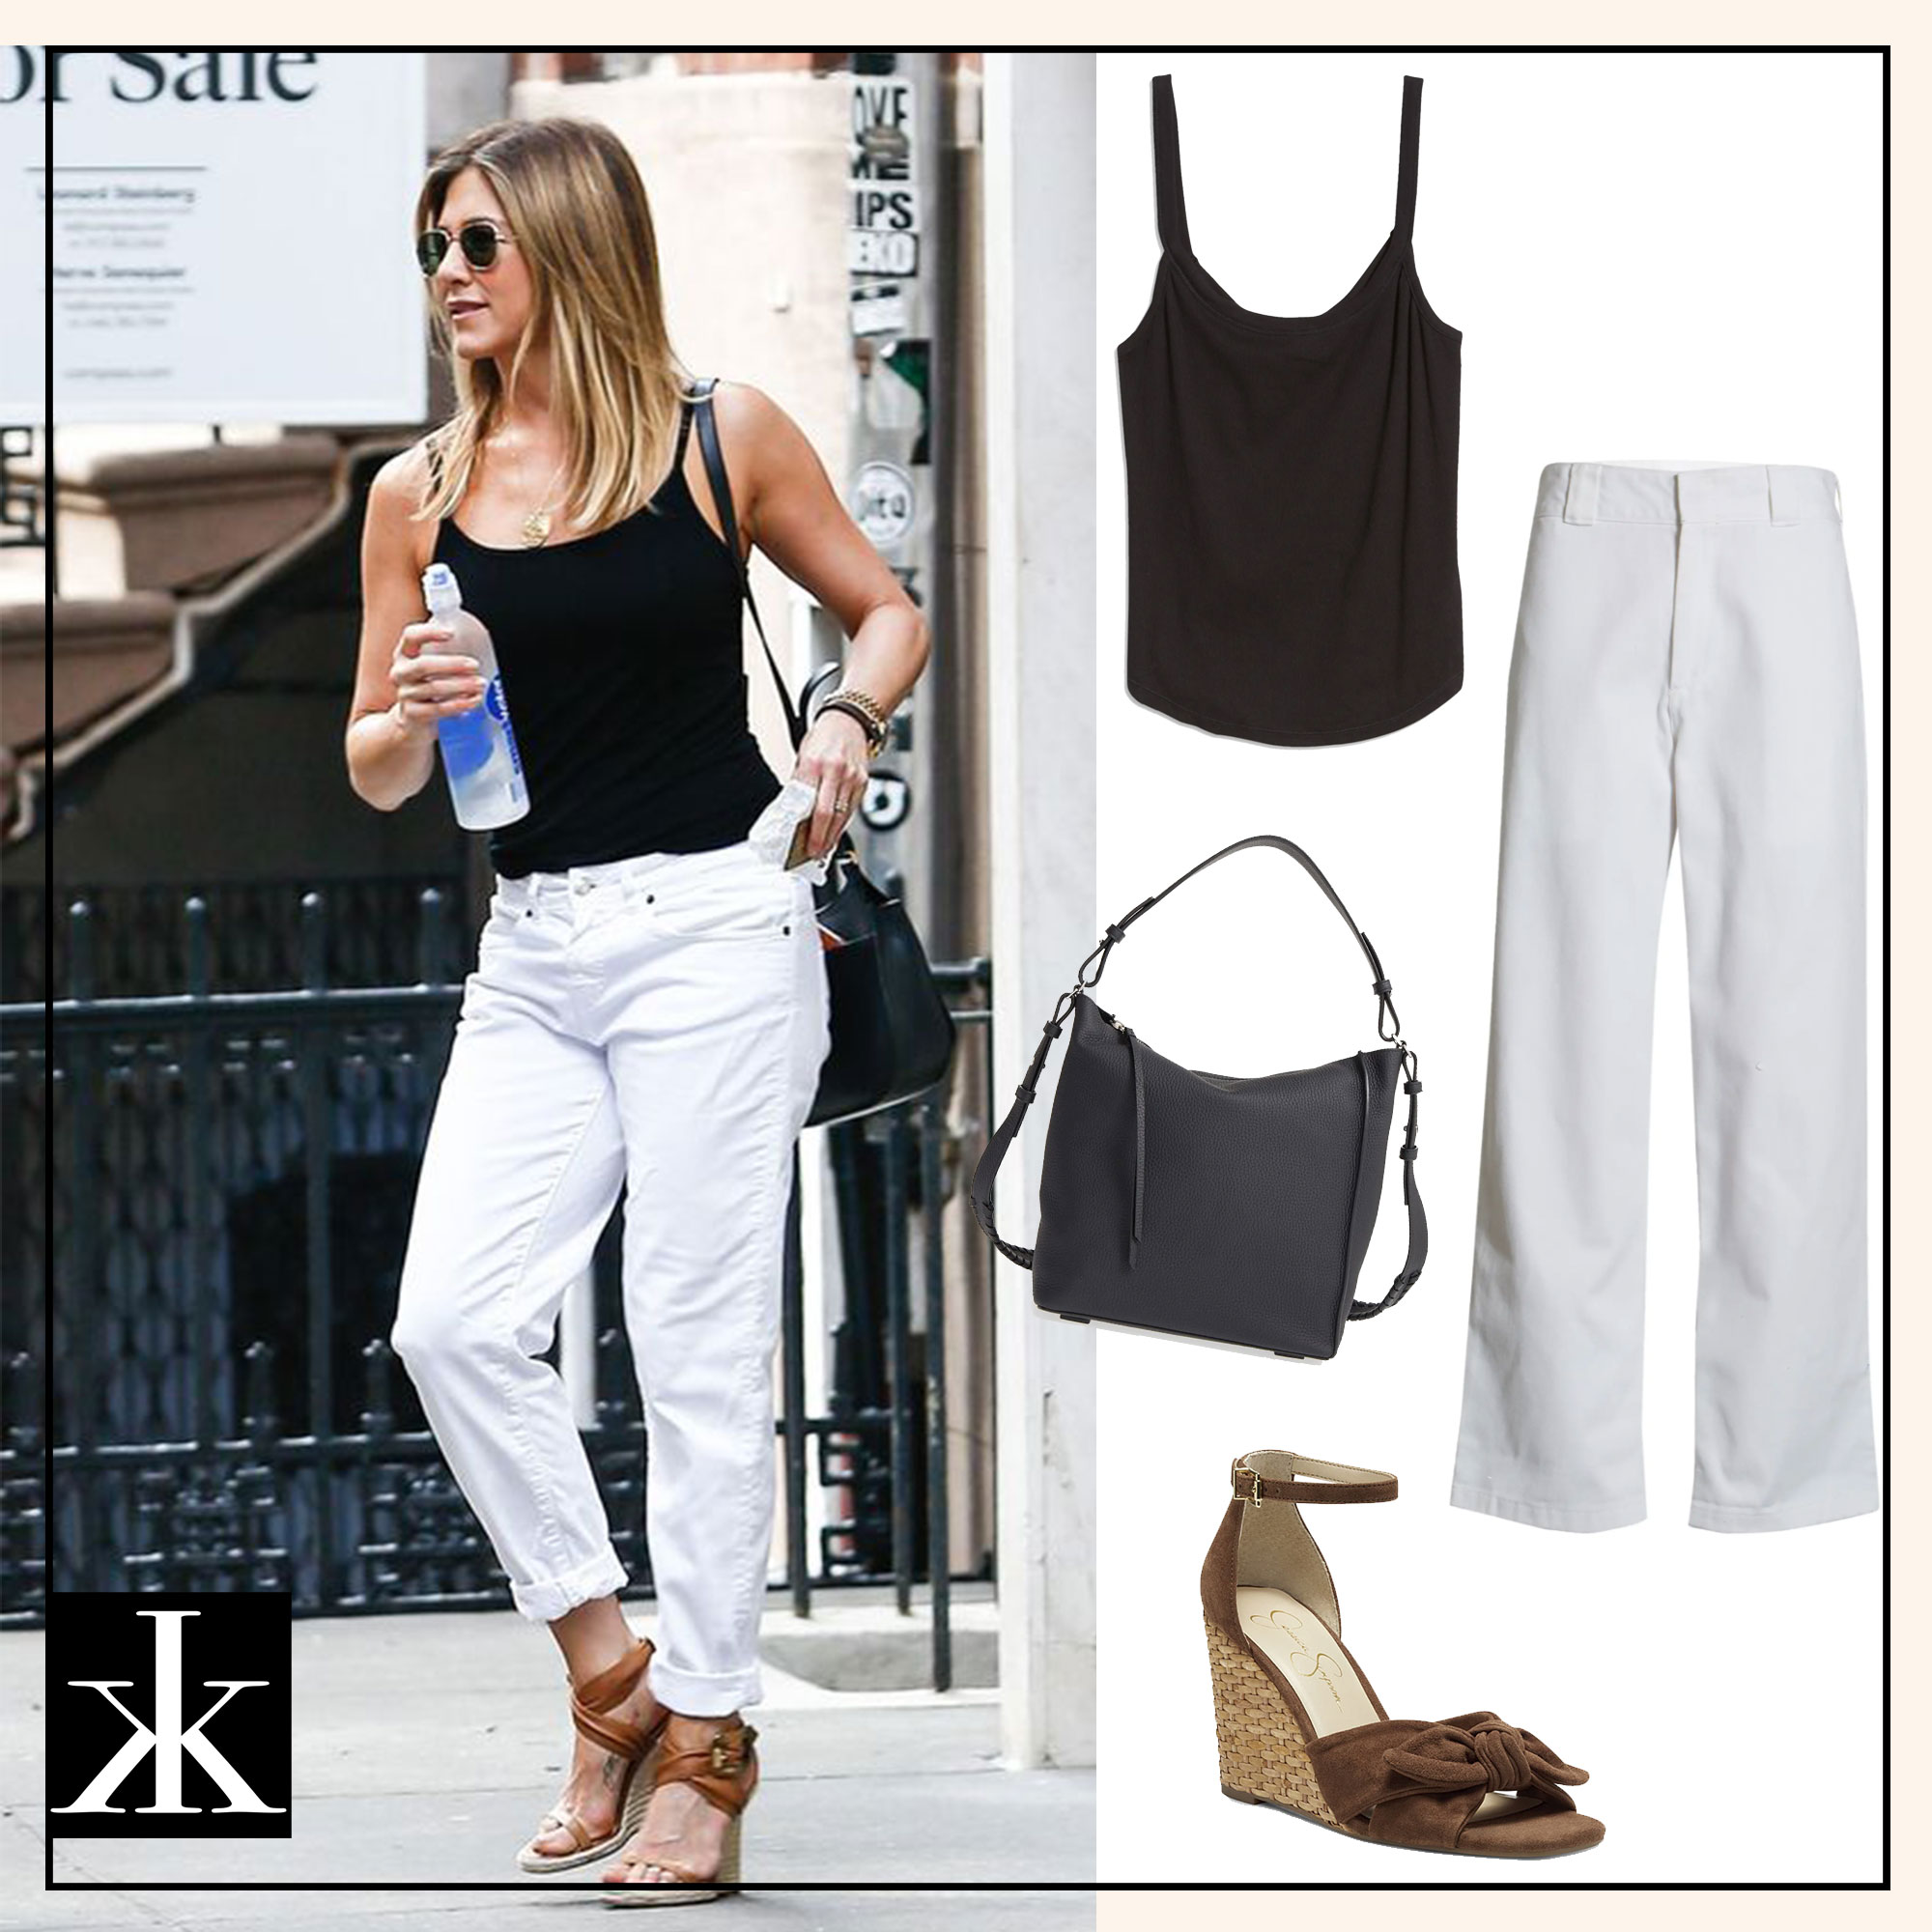 Jennifer Aniston Summer Out Inspiration 2